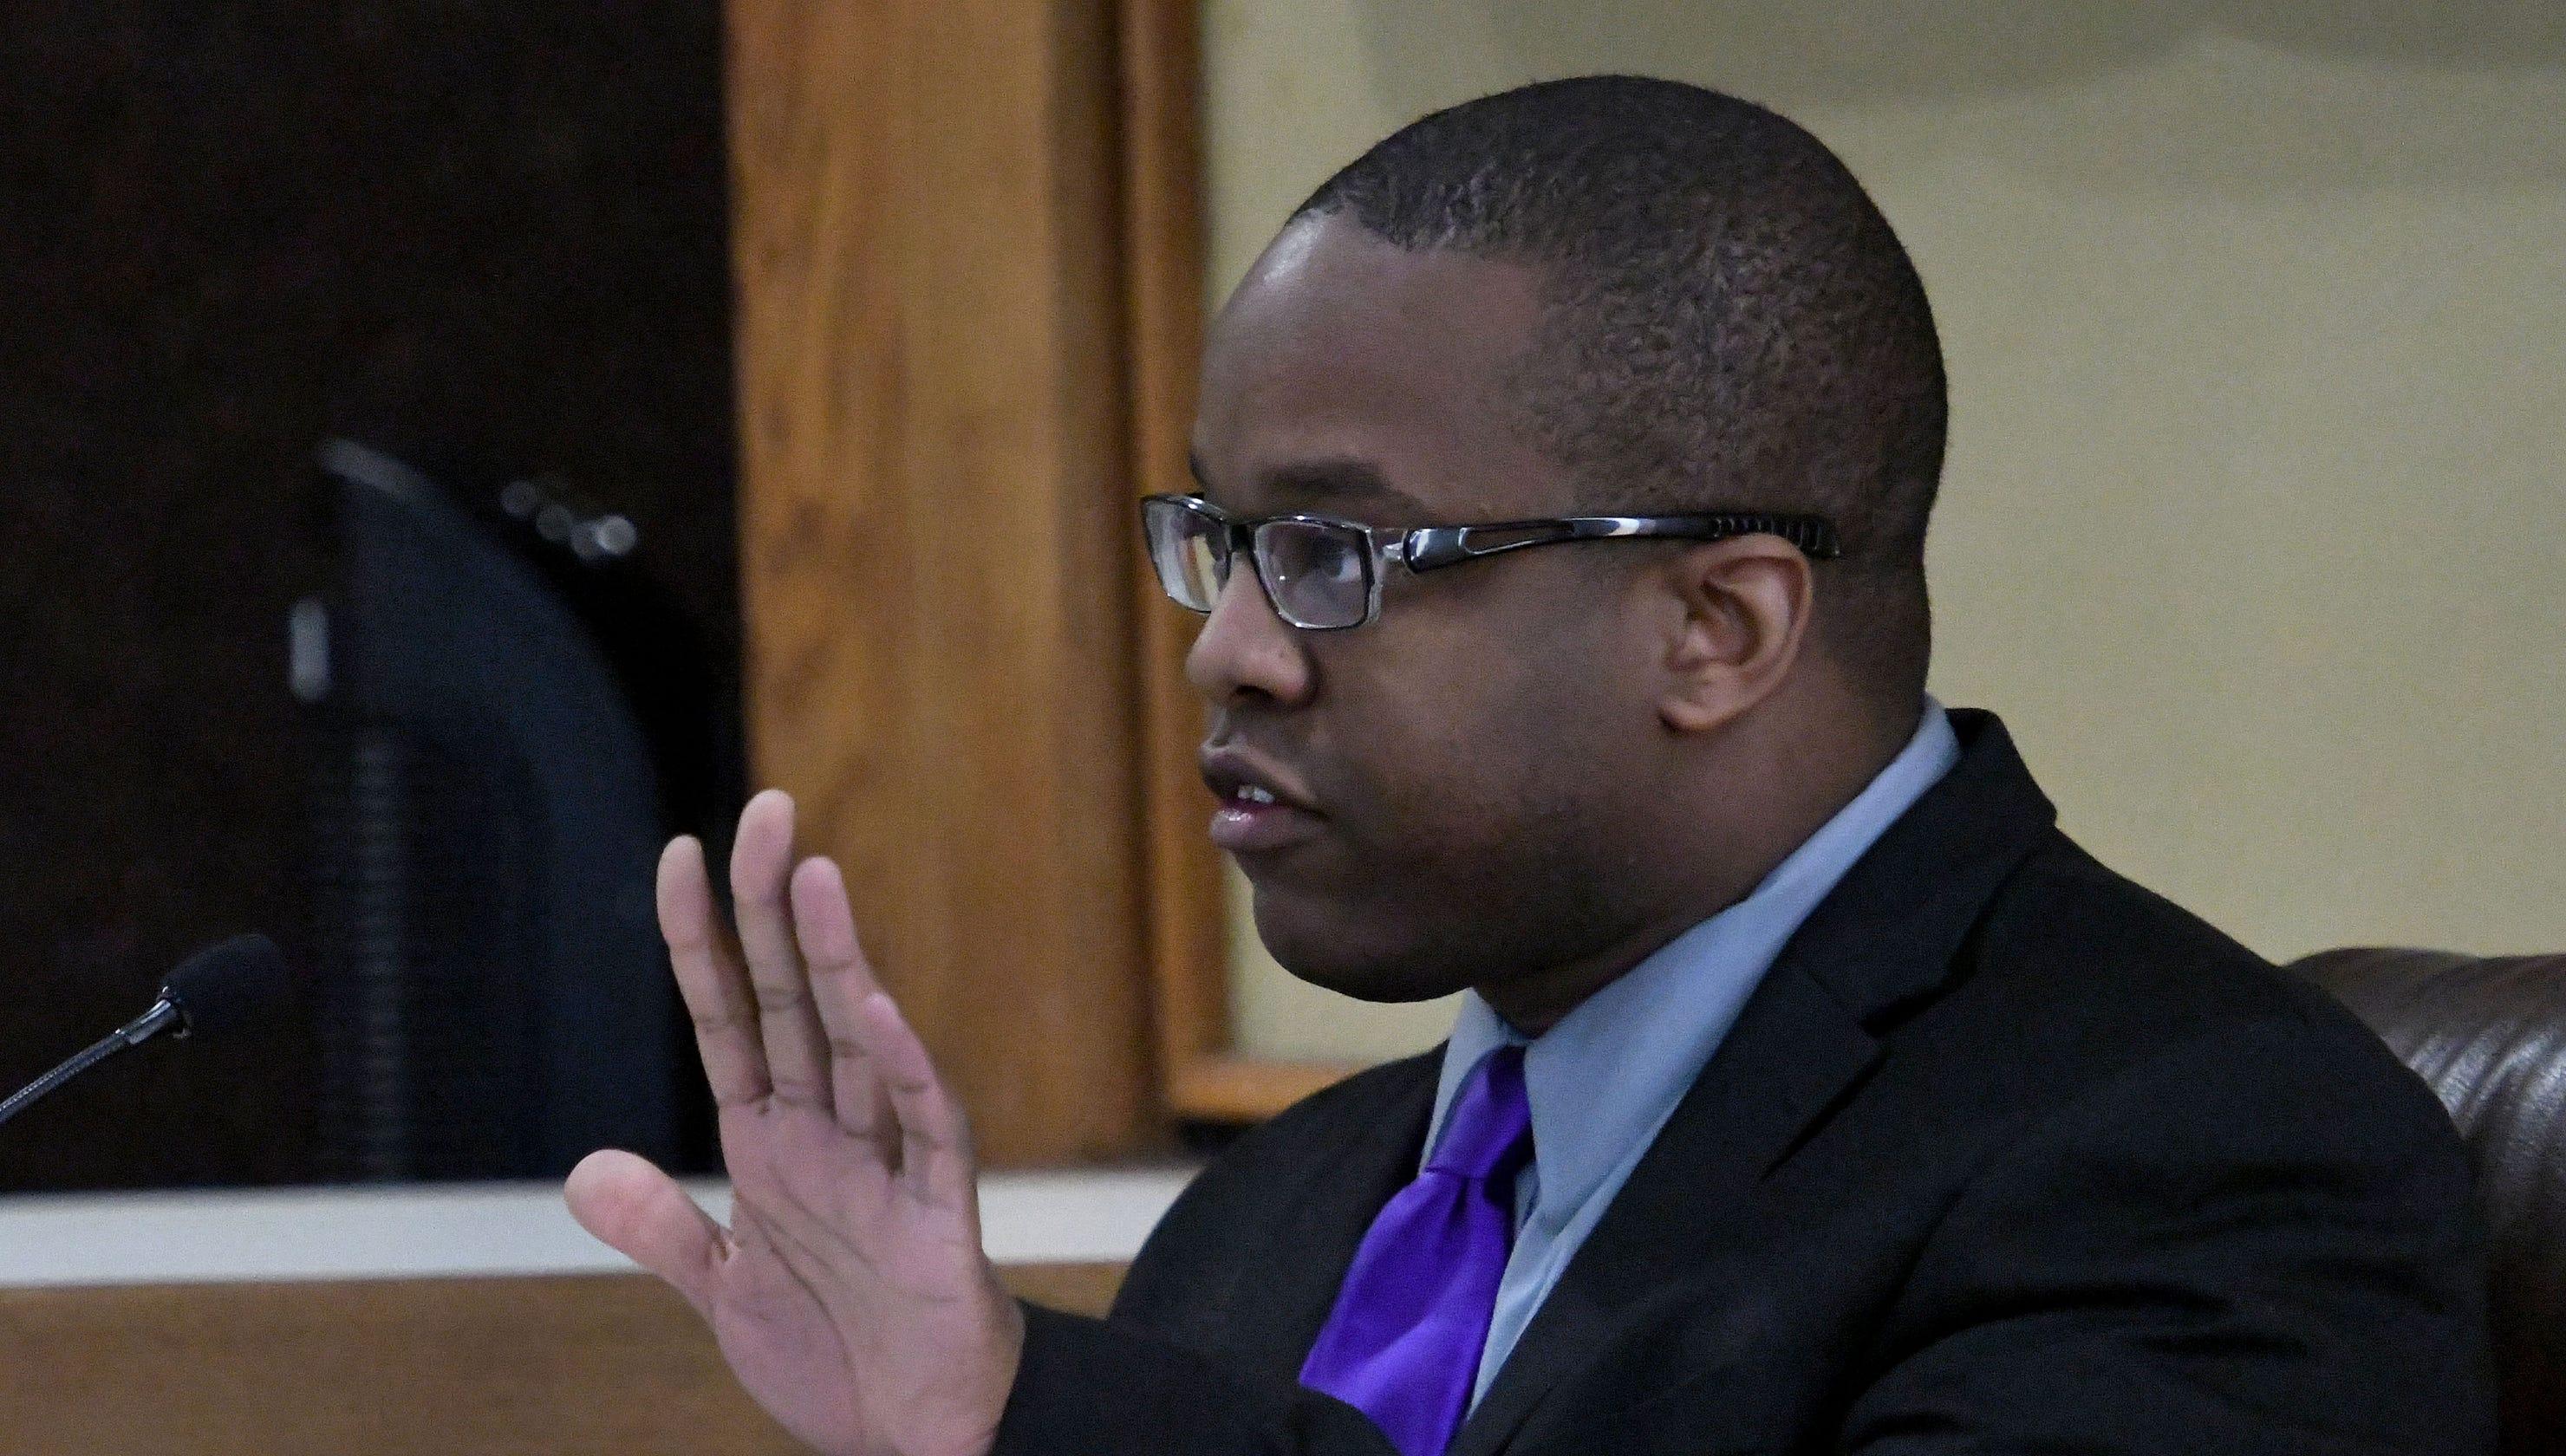 black deputy accuses egusd - HD2960×1680